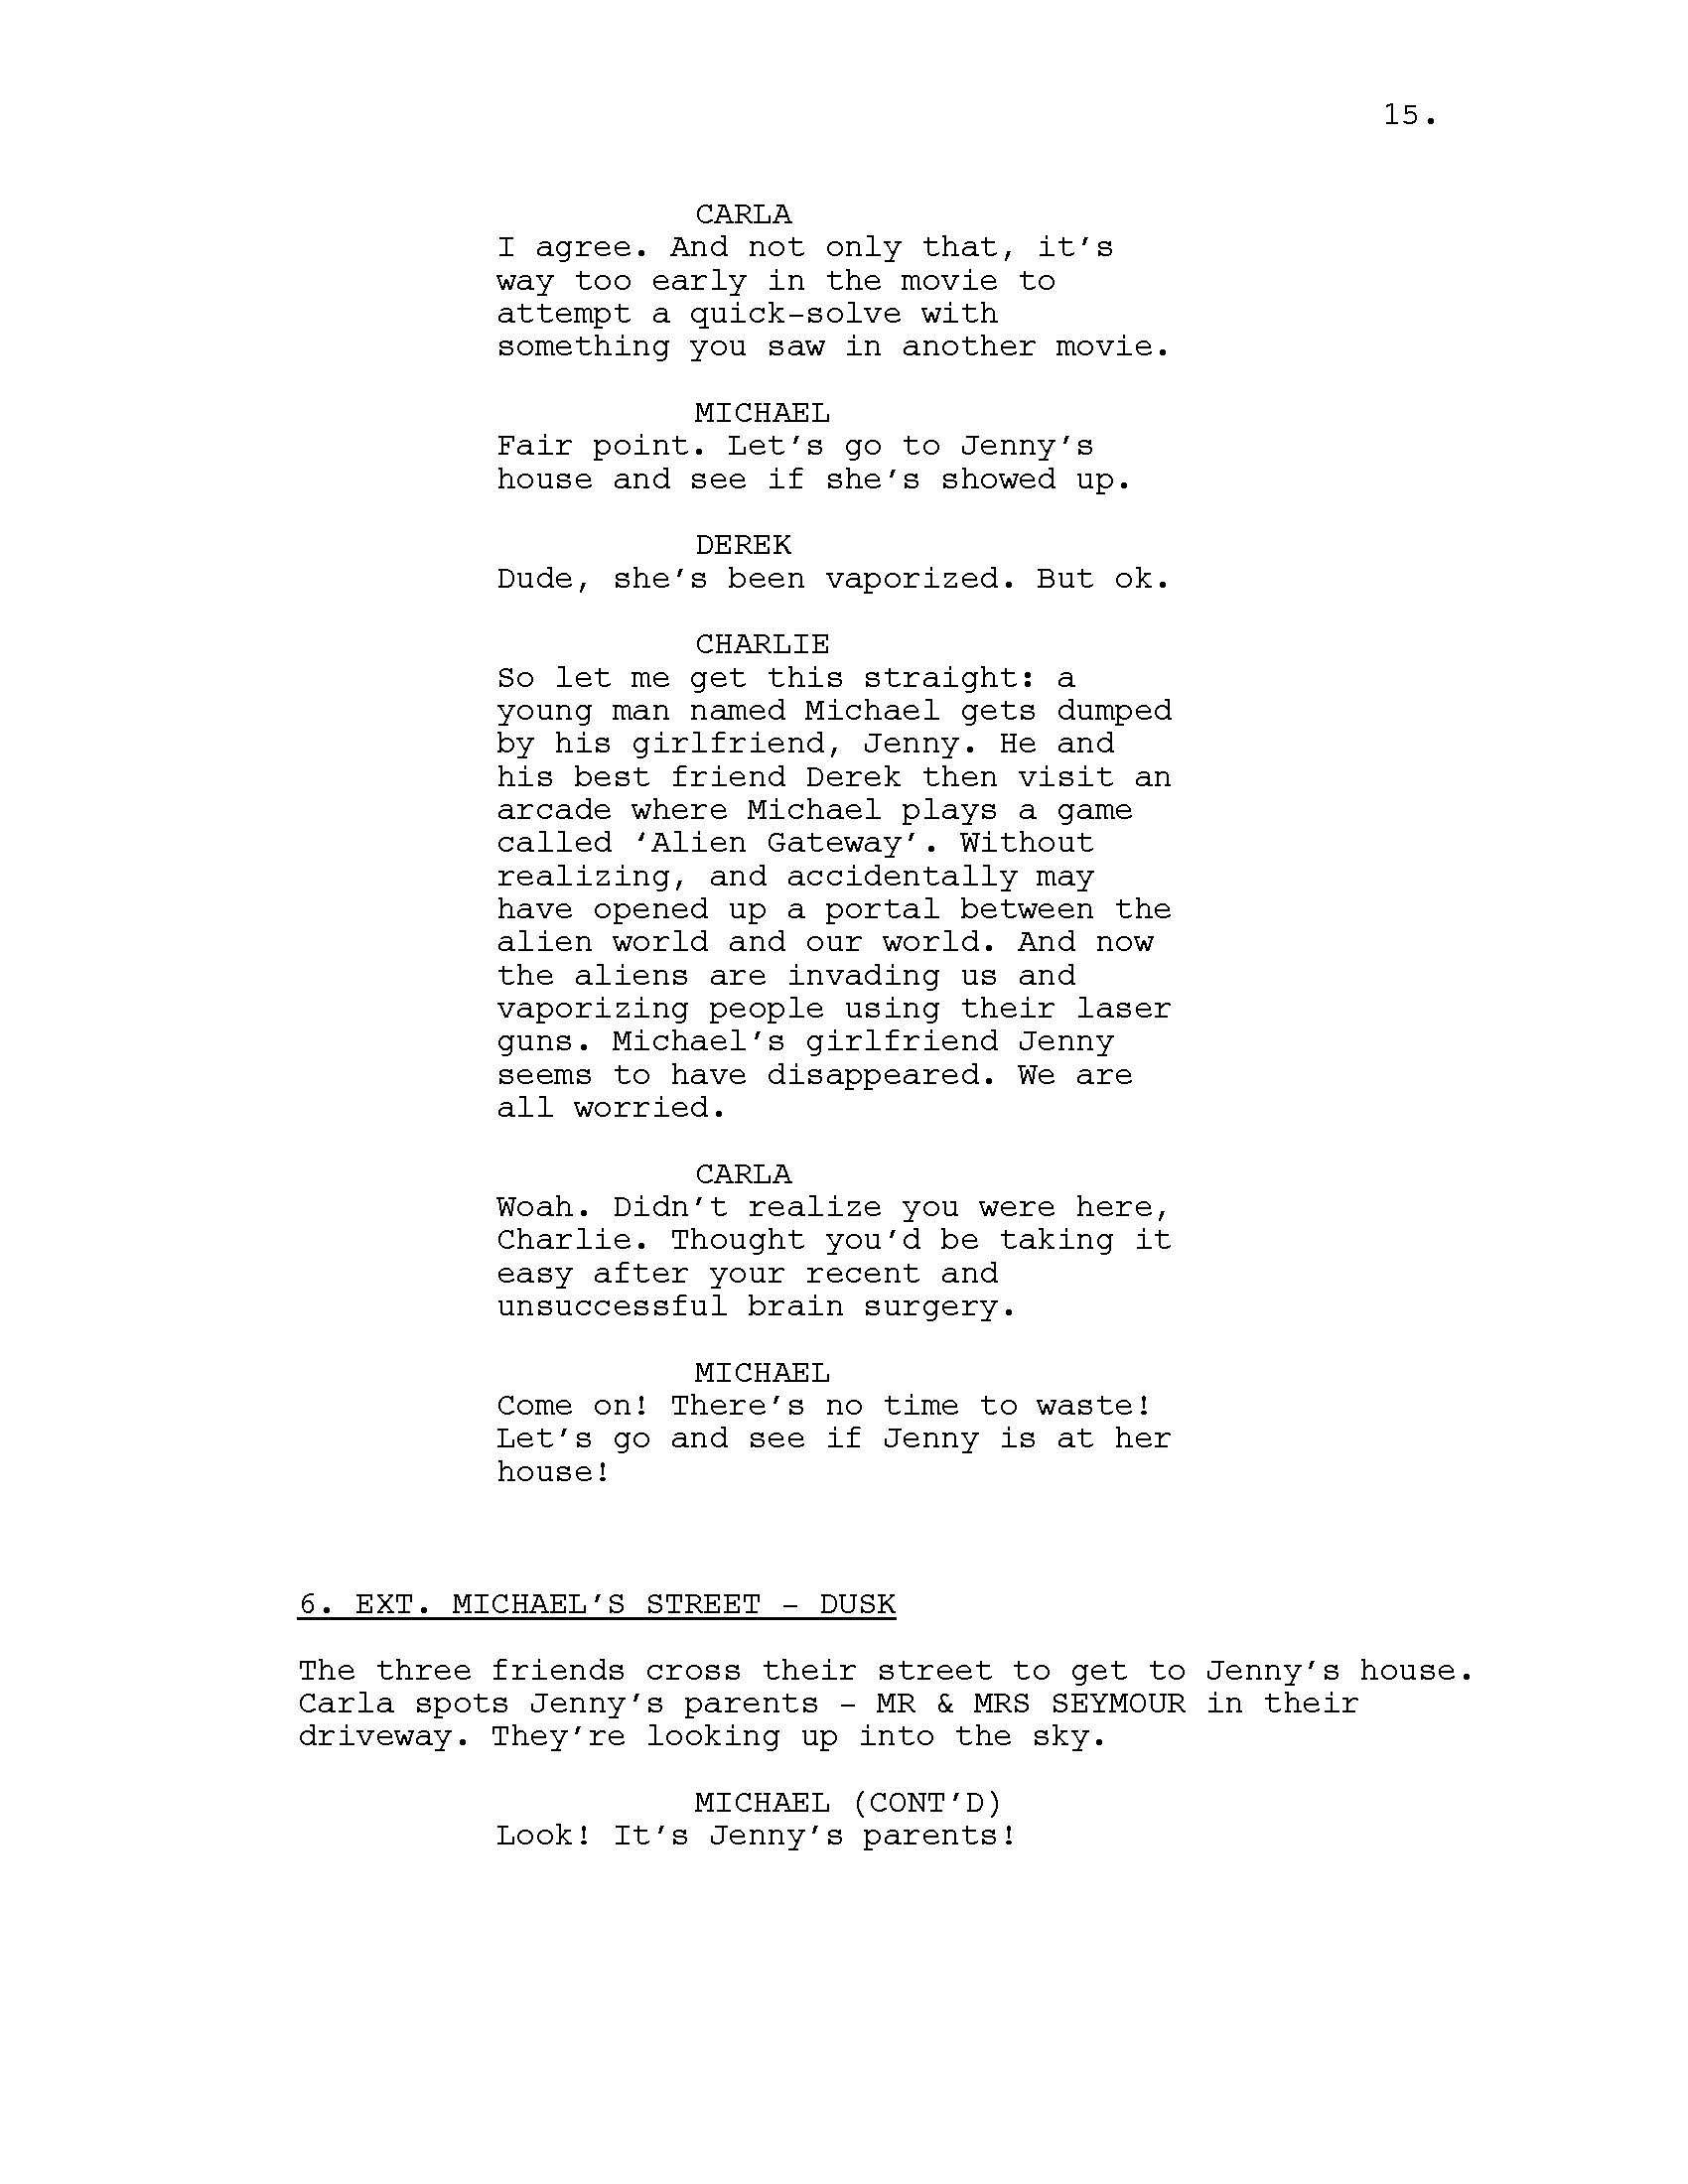 INVISIBLE WORLD SCRIPT_Page_016.jpg